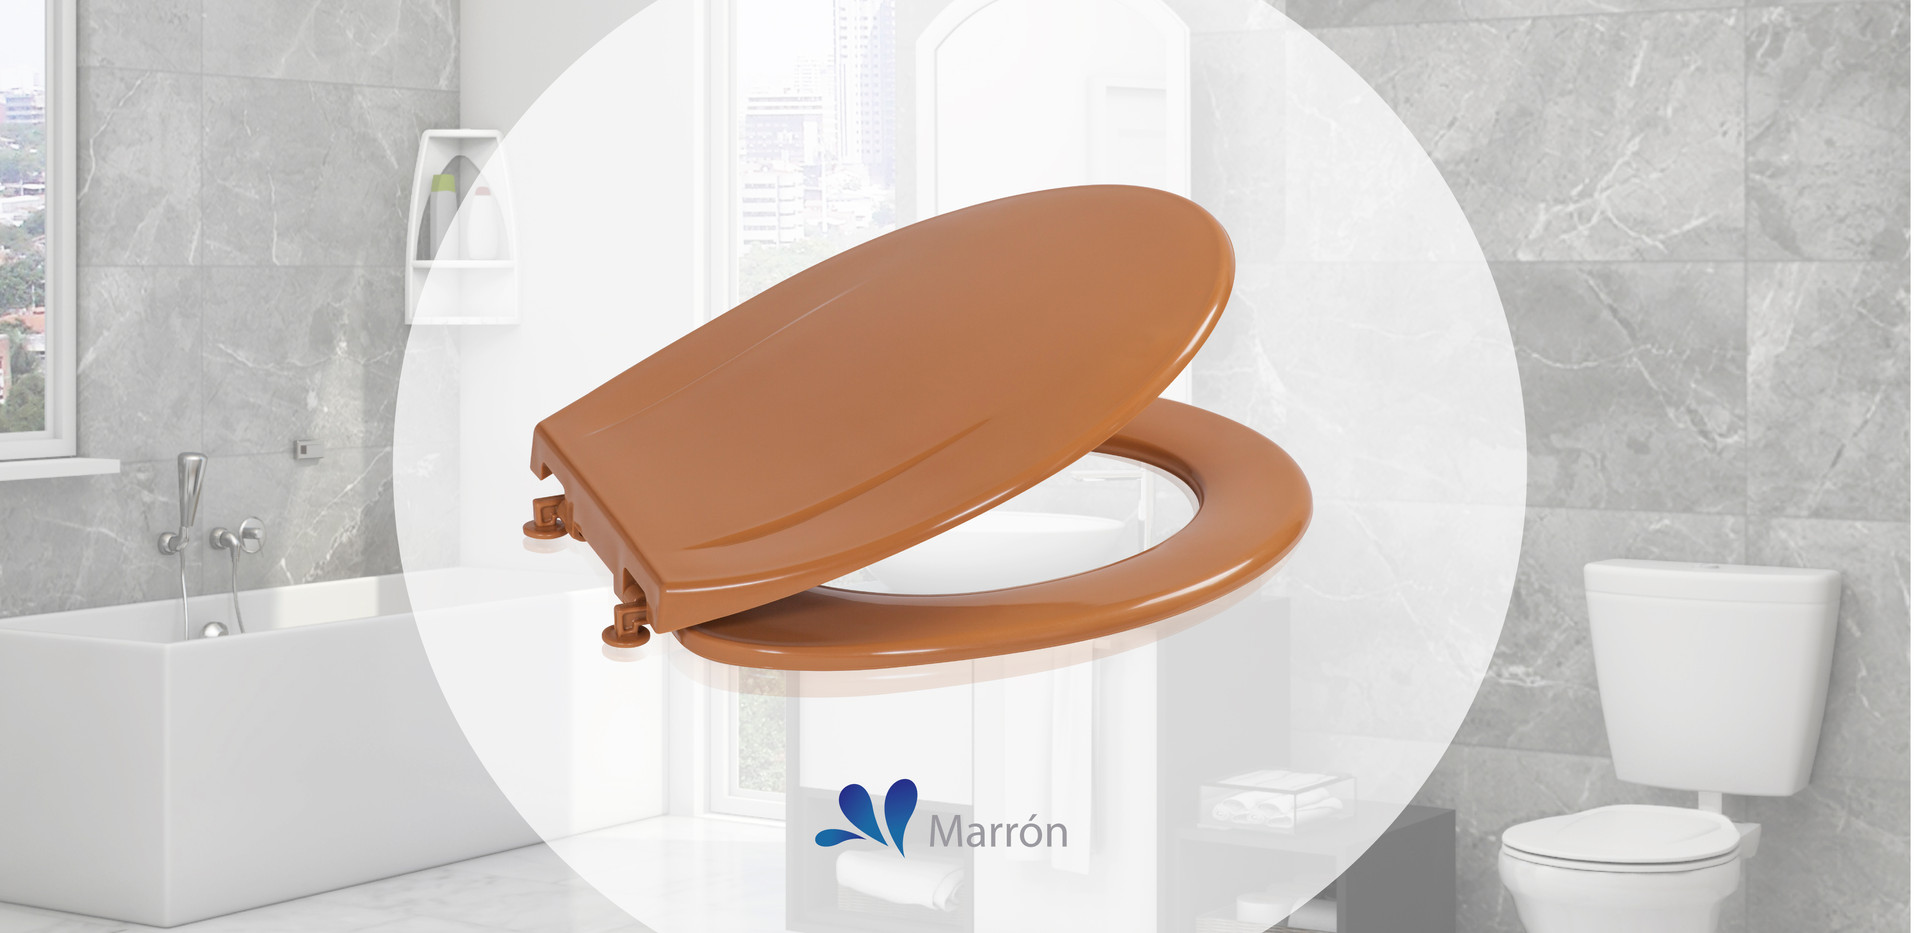 Luxury - Marrón